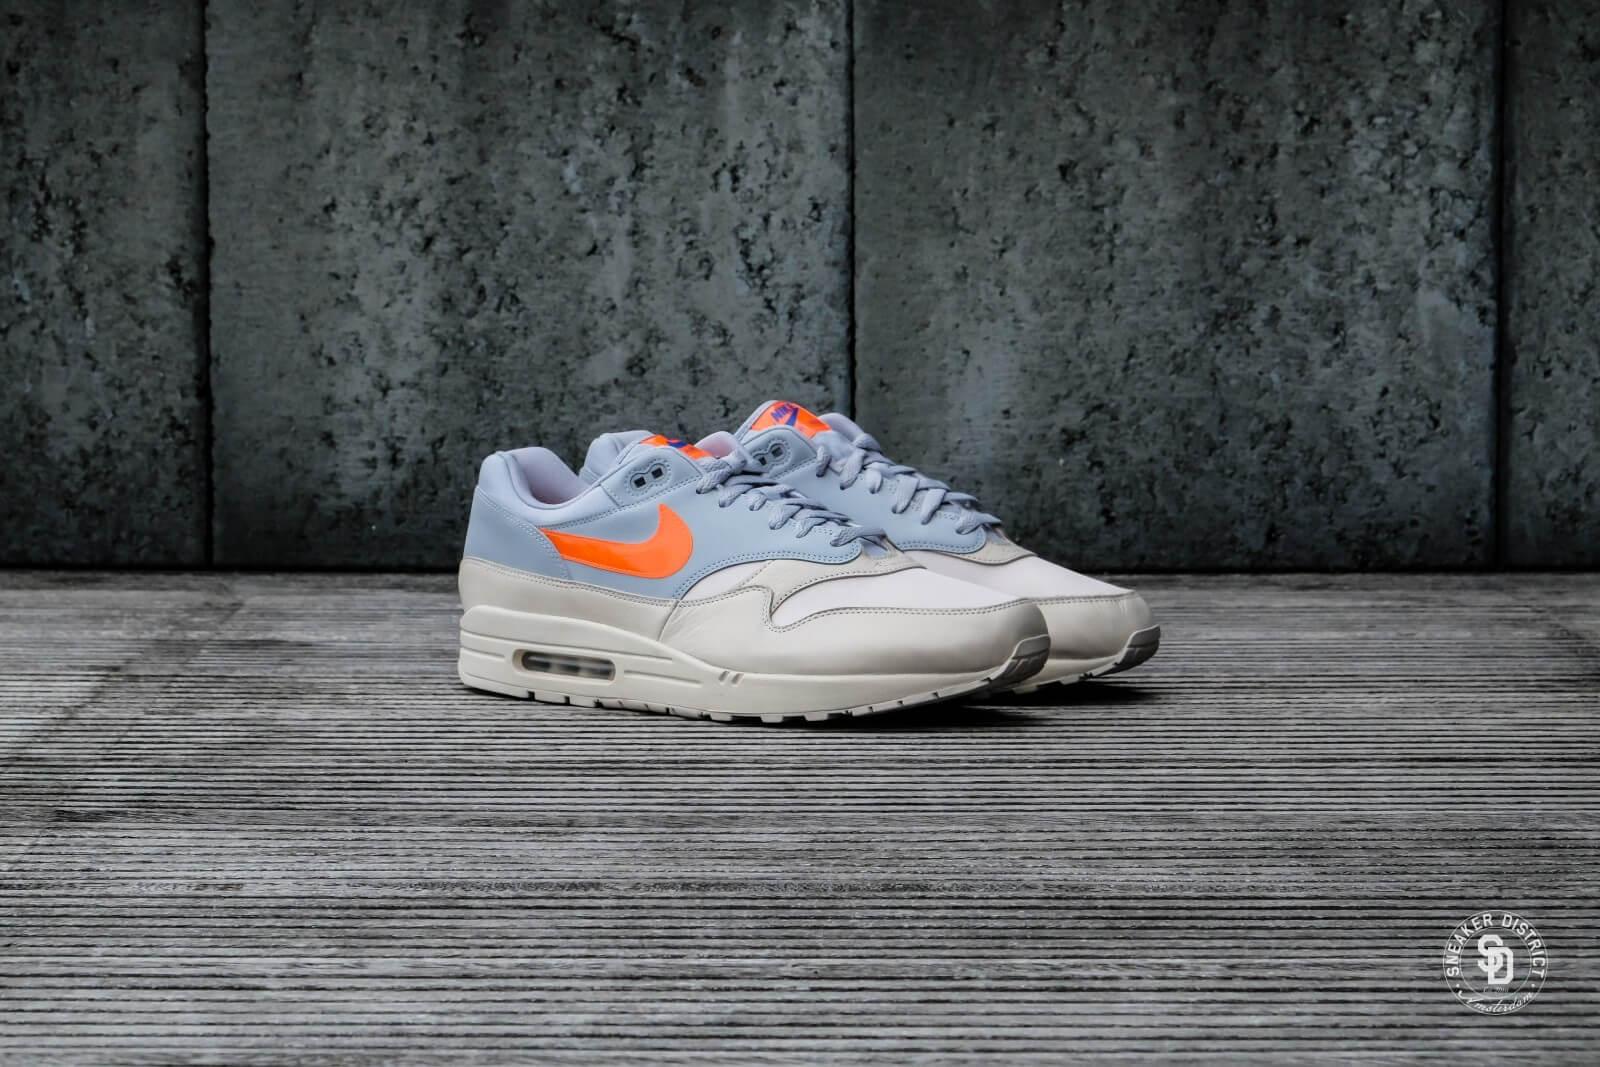 Nike Air Max 1 Desert Sand/Total Orange